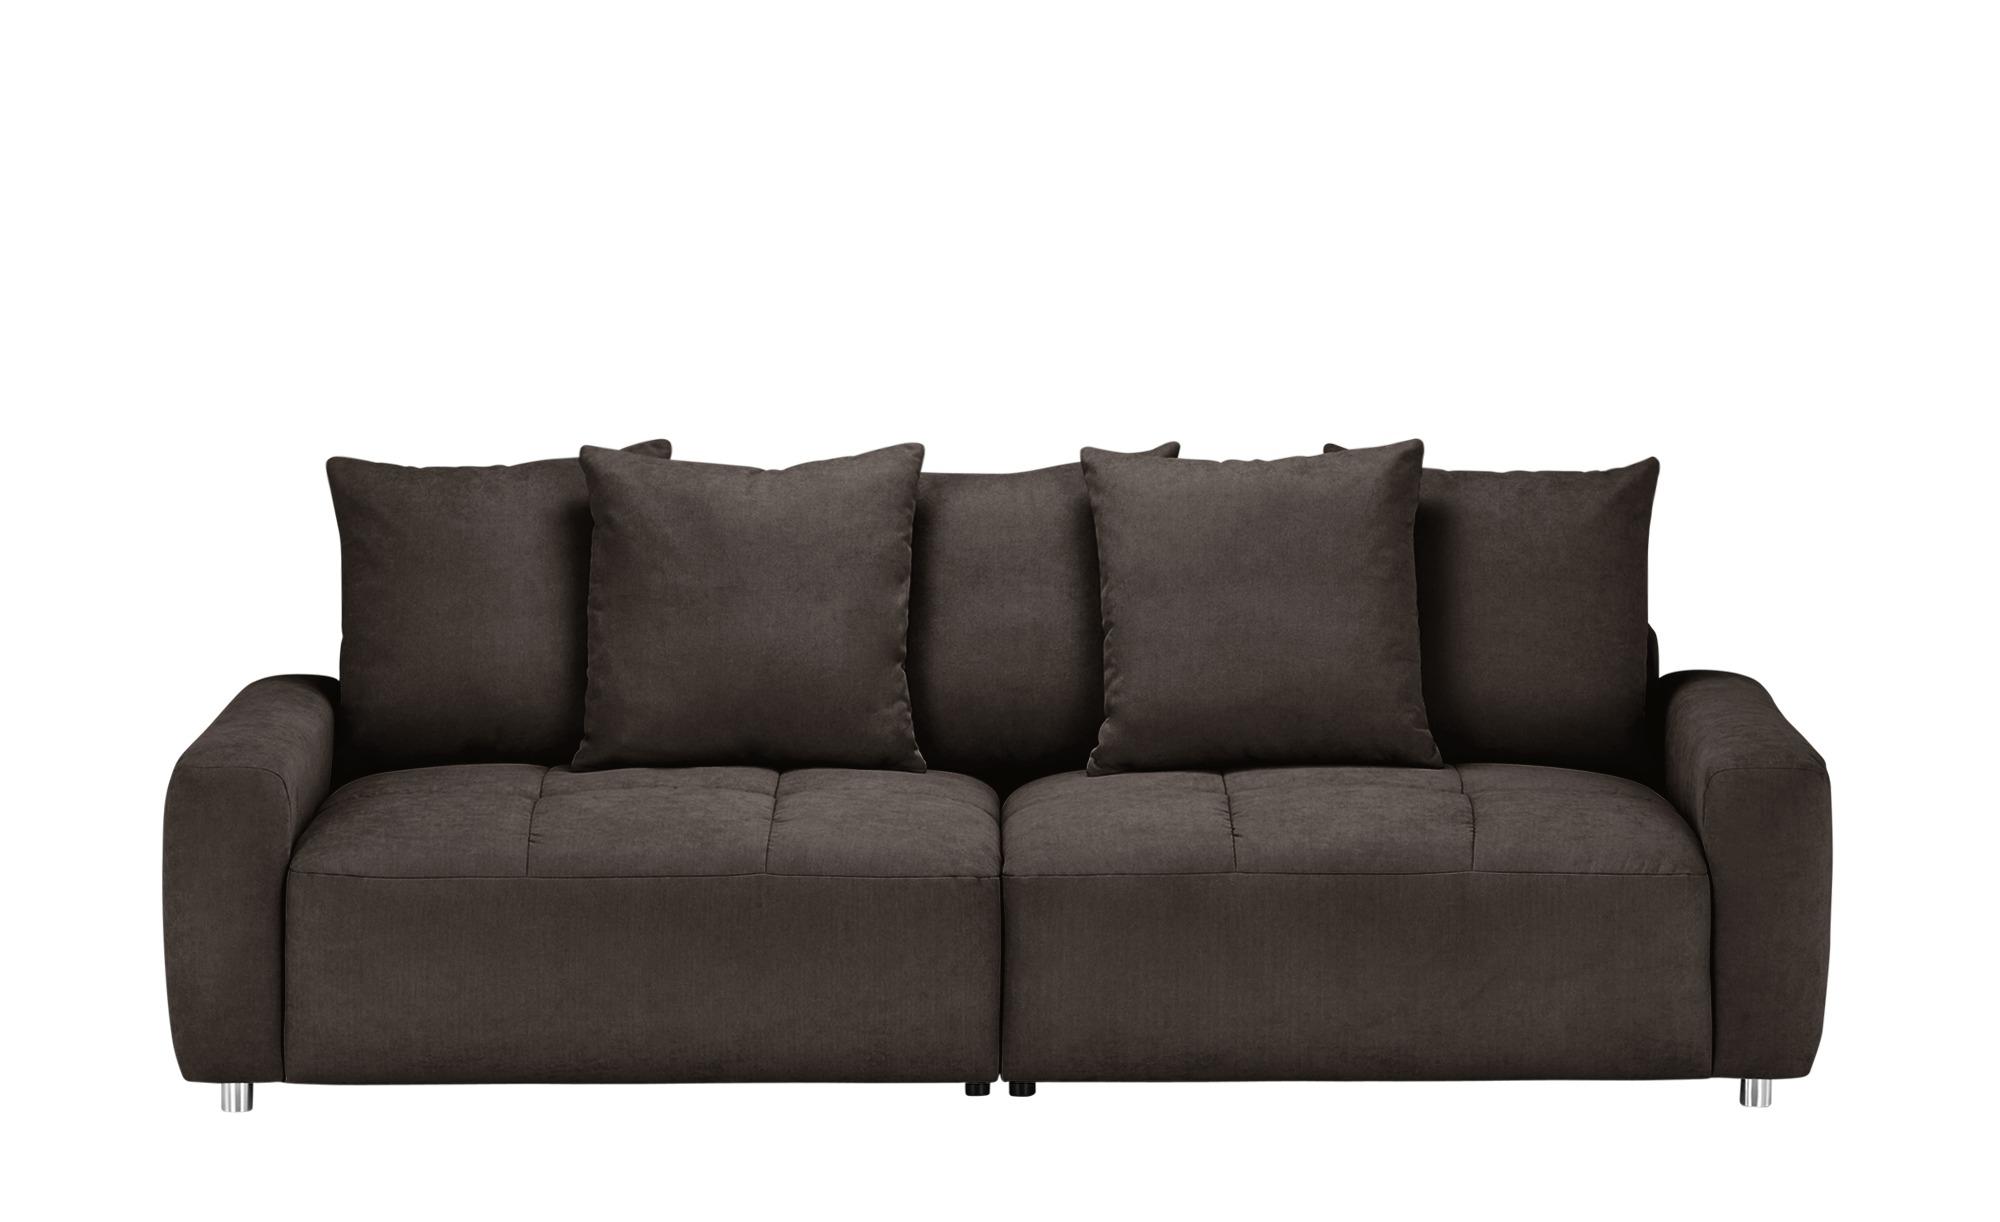 bobb Big Sofa  Betty ¦ braun ¦ Maße (cm): B: 266 H: 90 T: 104 Polstermöbel > Sofas > Big-Sofas - Höffner